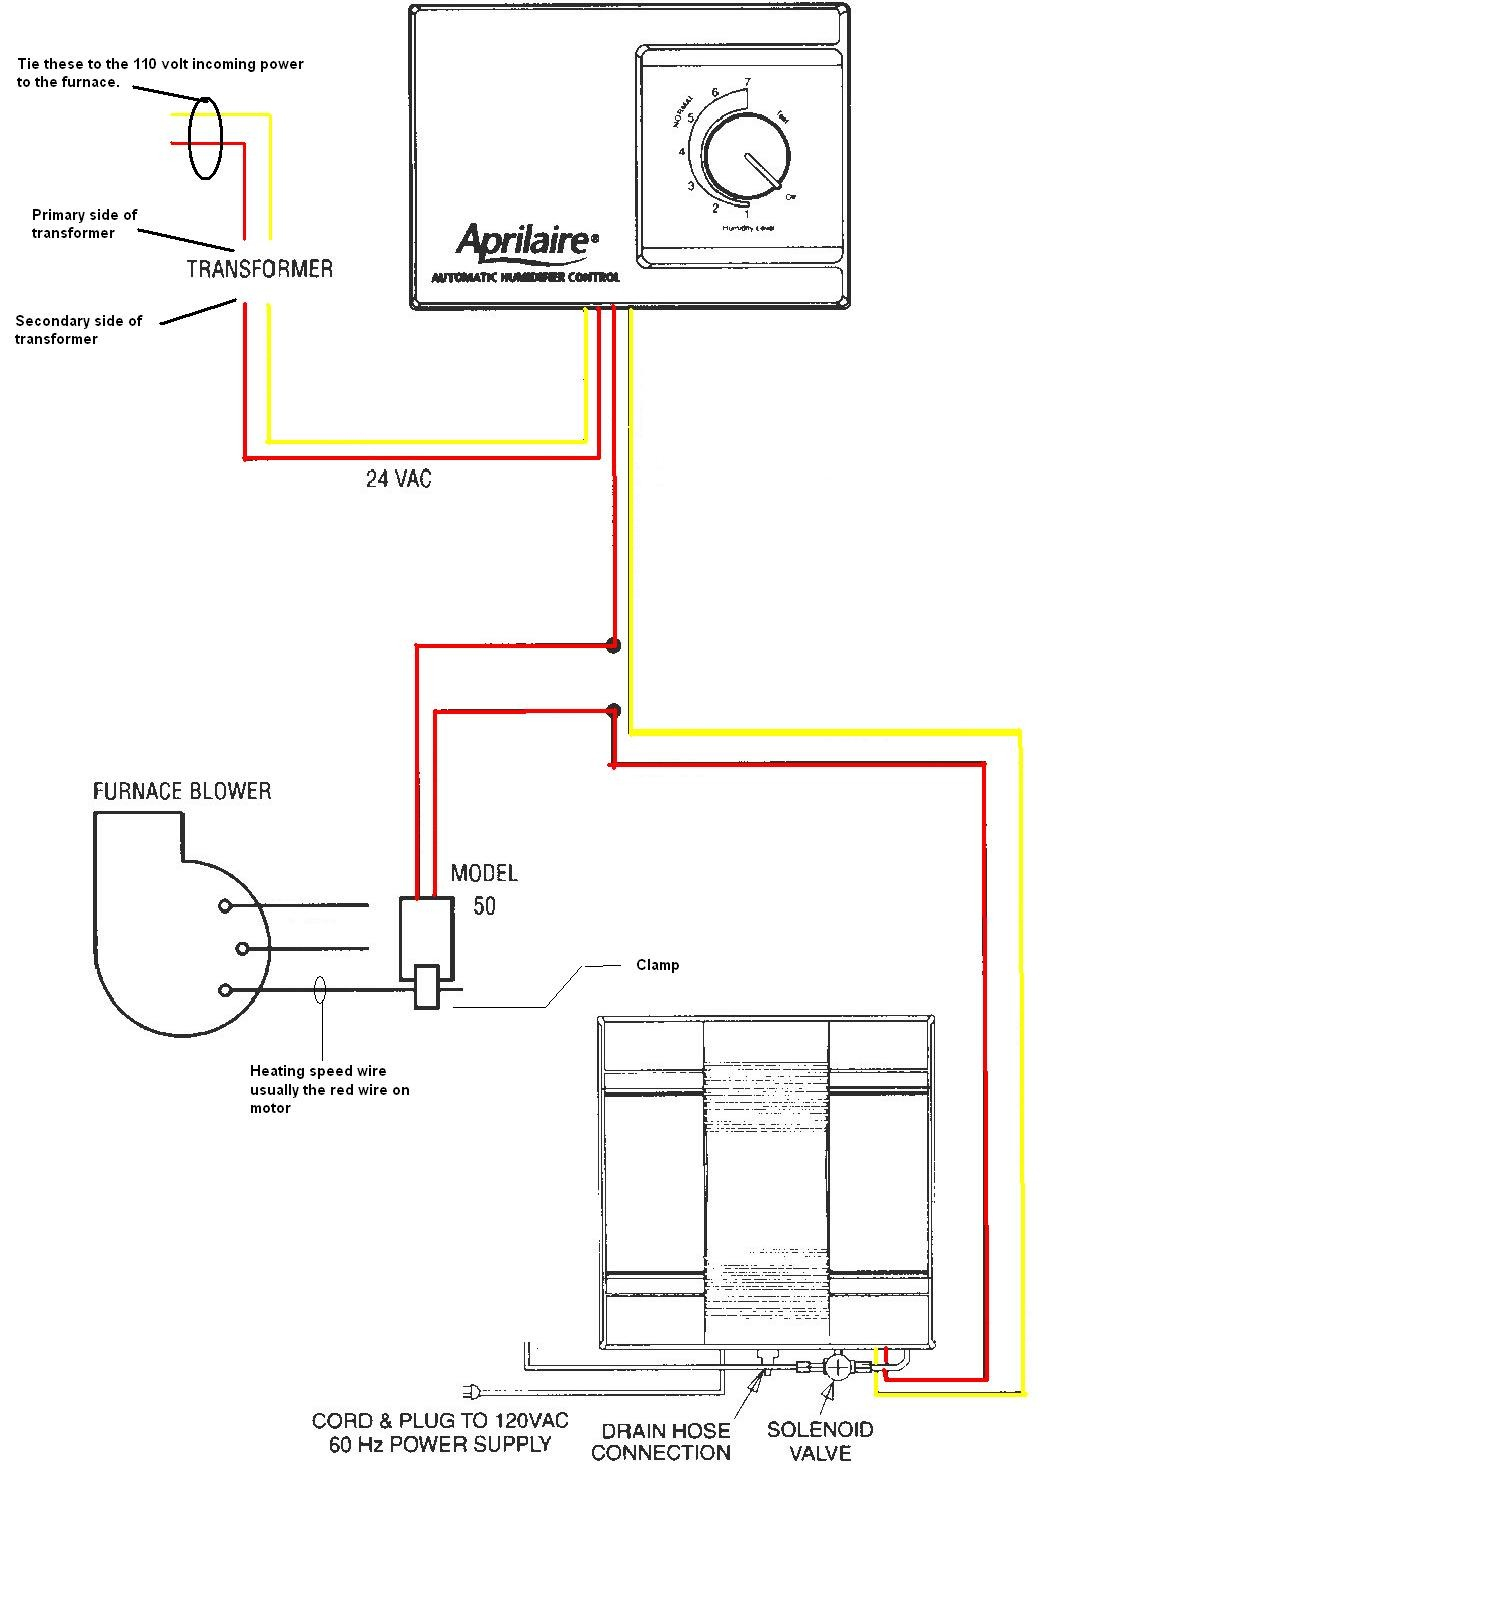 Bryant Humidifier Wiring Diagram Schematic Electronic Power Symbol Modern Aprilaire Wire Data Schema Rh Frana Co Rhjabvwisemamablog